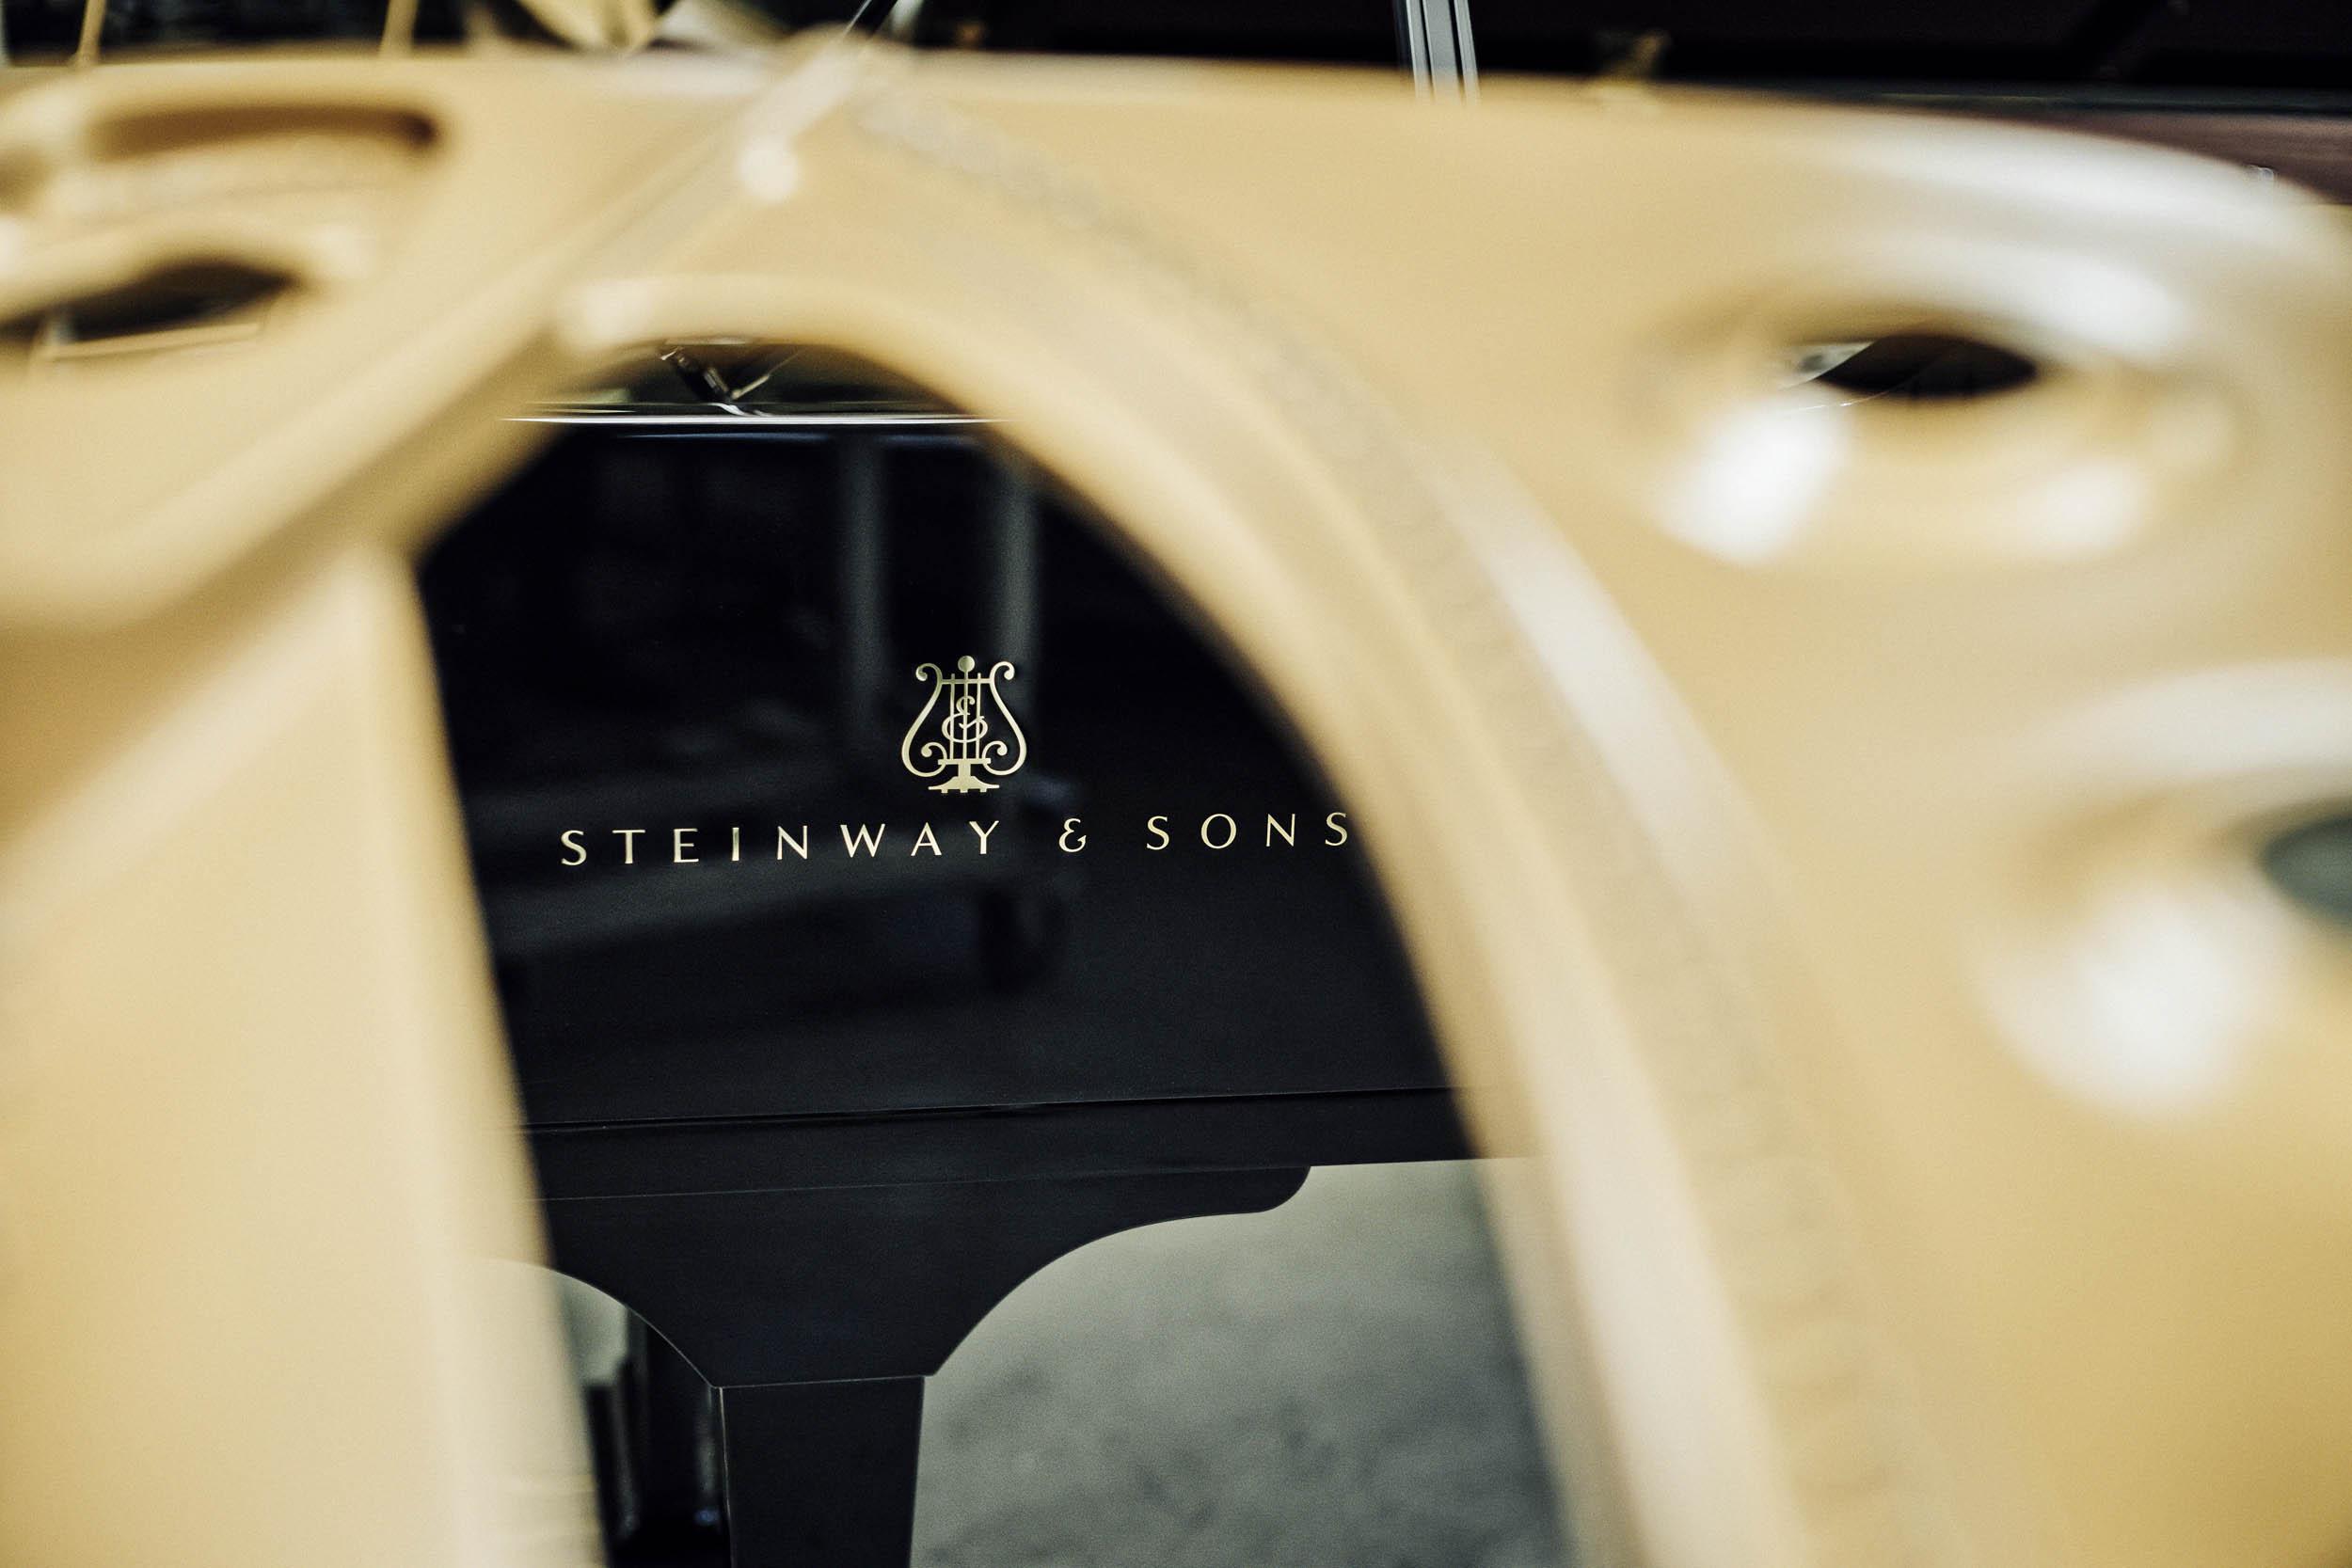 2019-SeifertUebler-steinway-piano-008.jpg